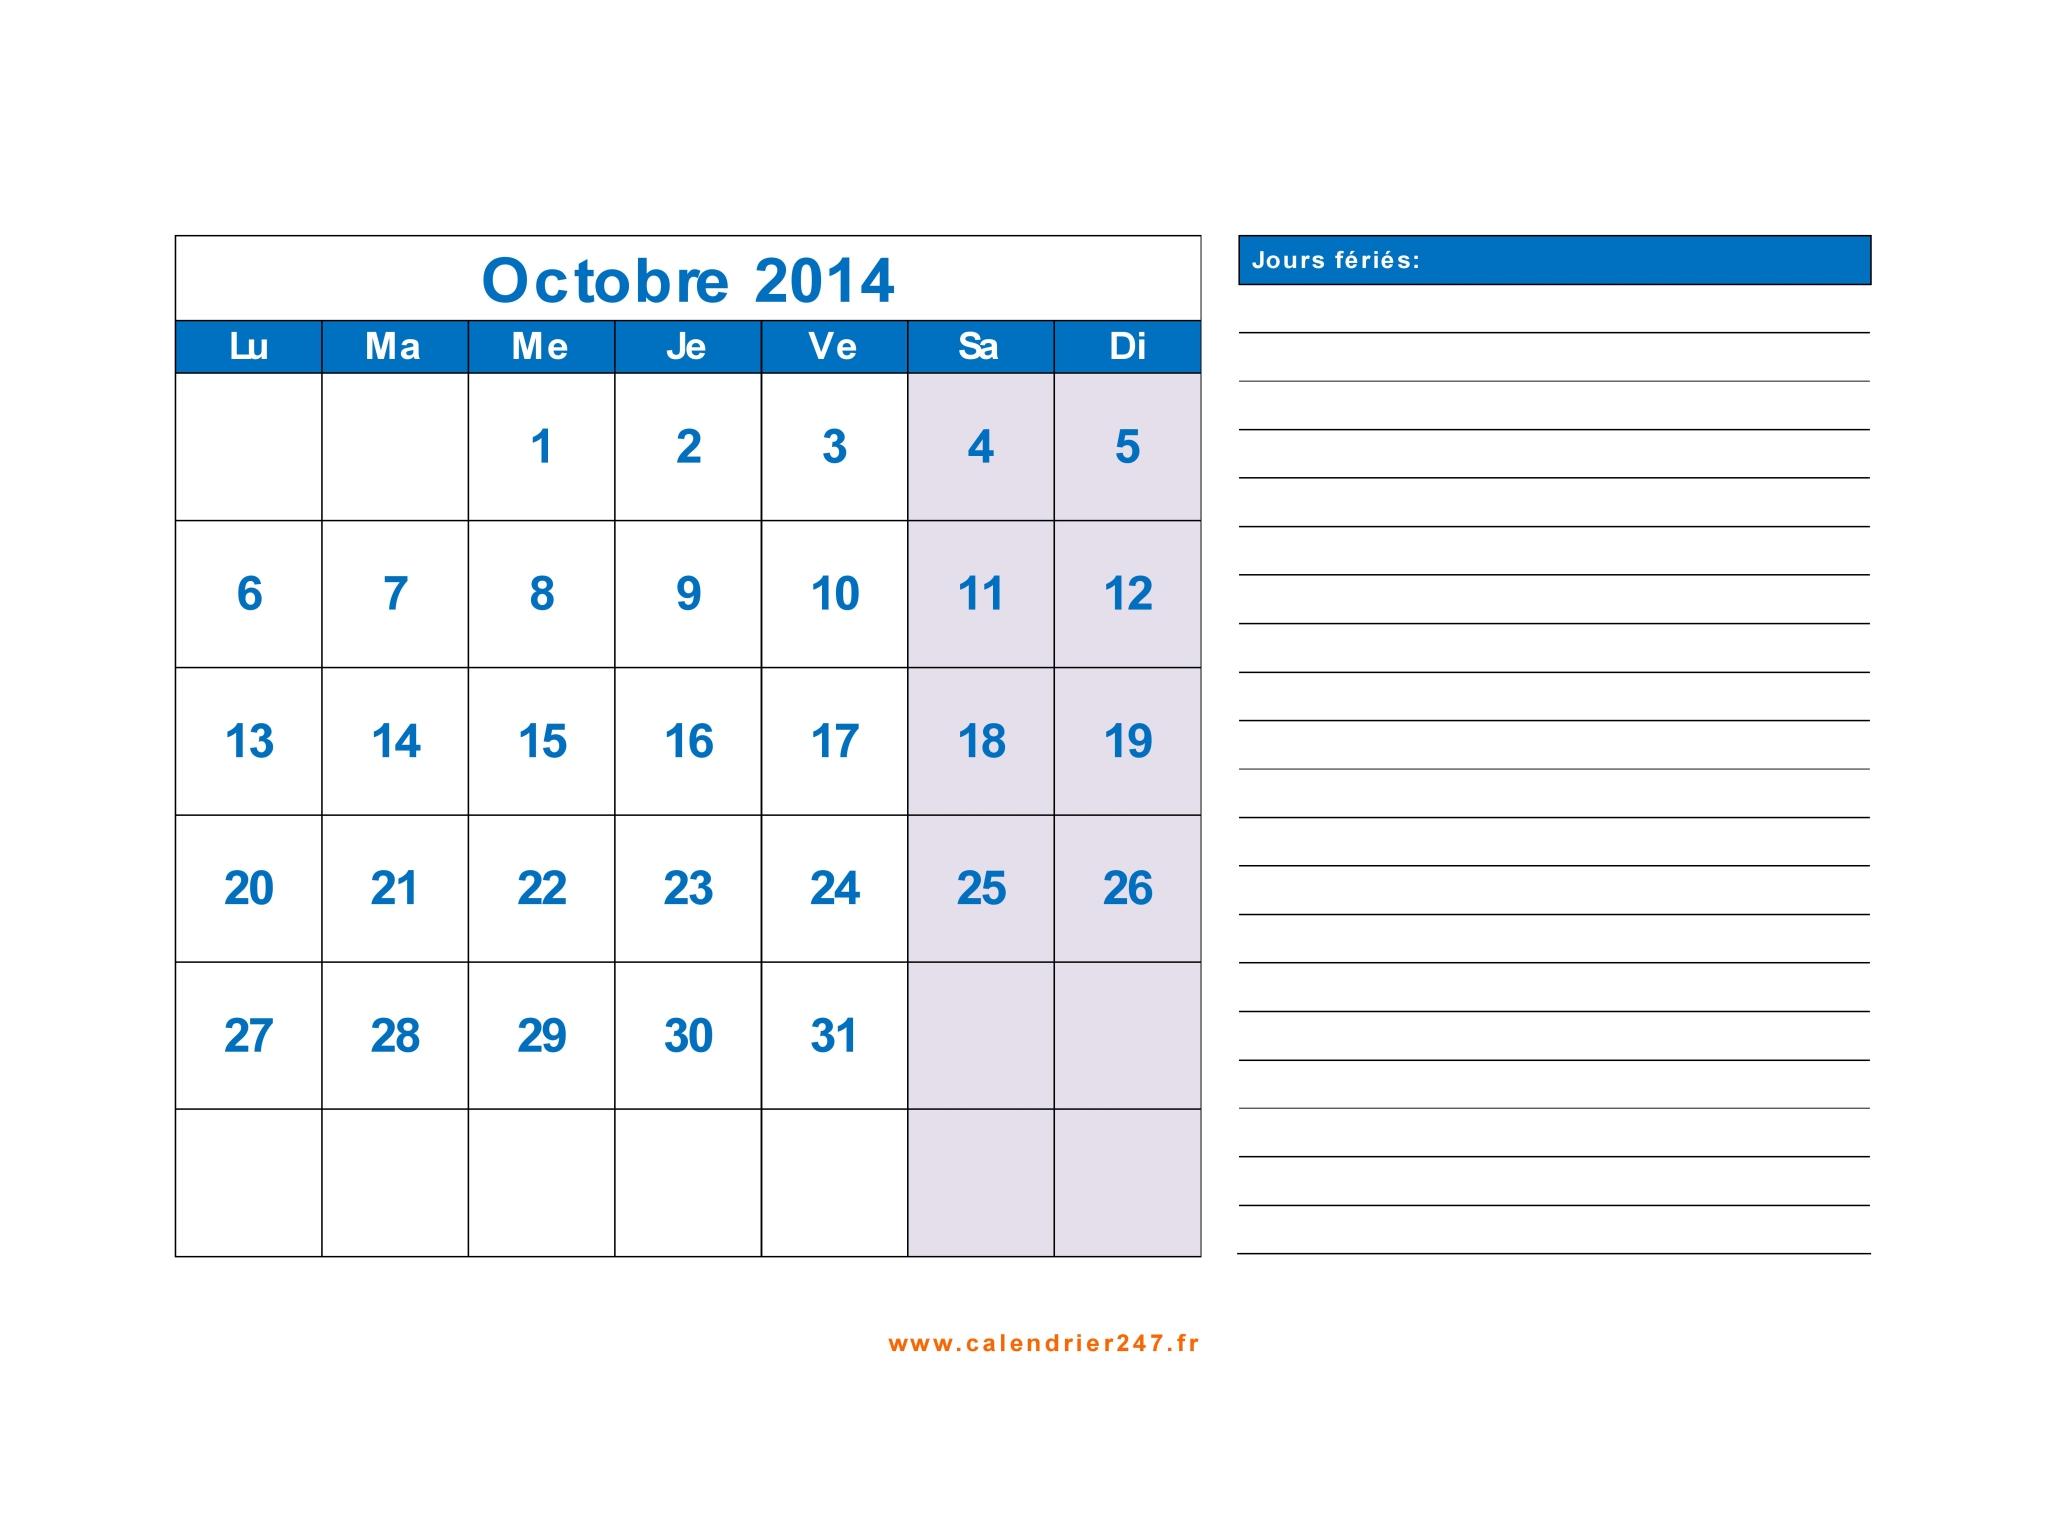 Calendrier vacances scolaires 2015 car tuning - Vacances scolaires octobre 2015 ...